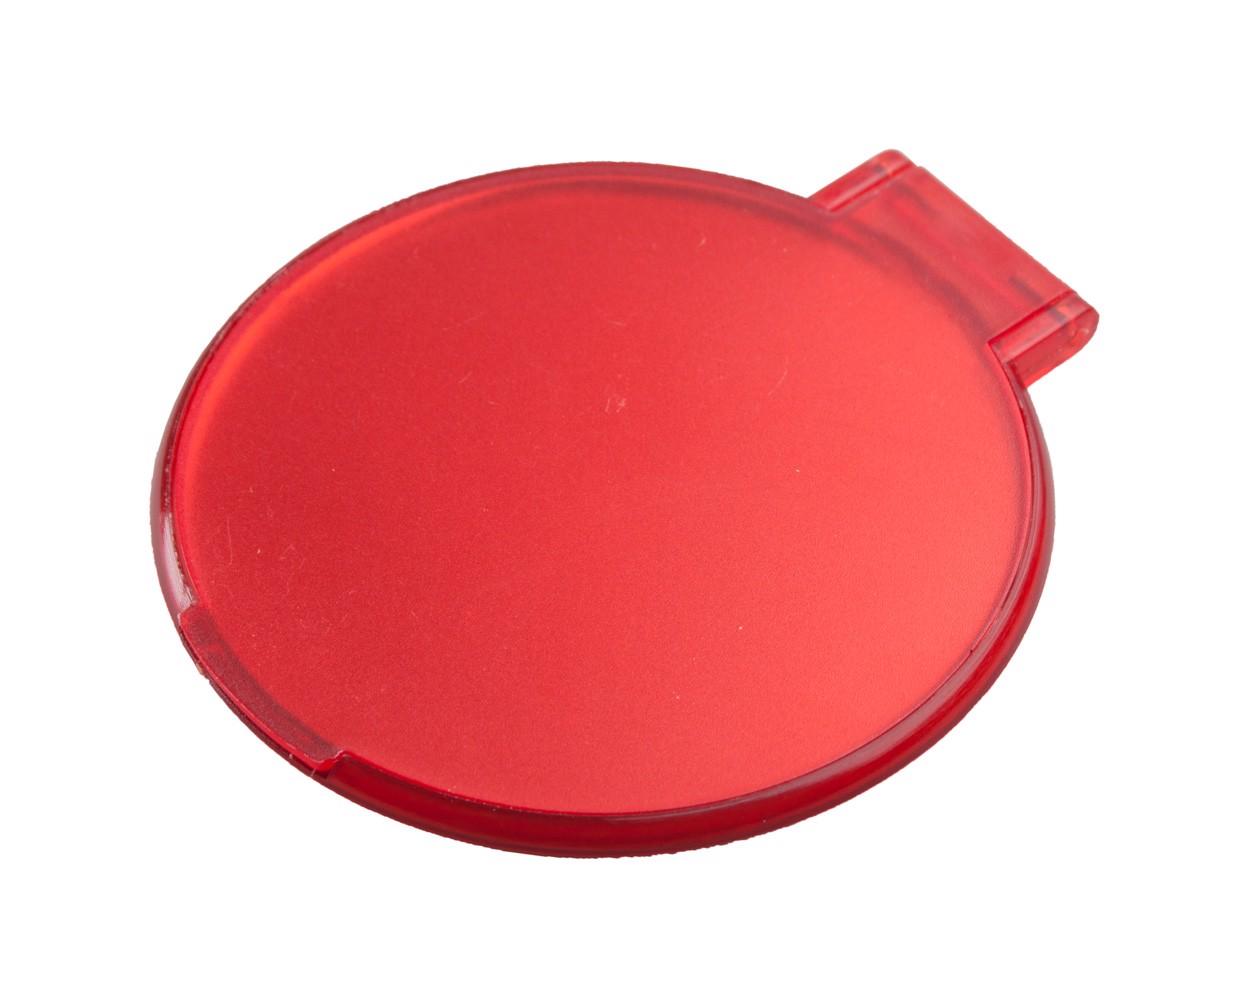 Zrcátko Thiny - Červená / Bílá